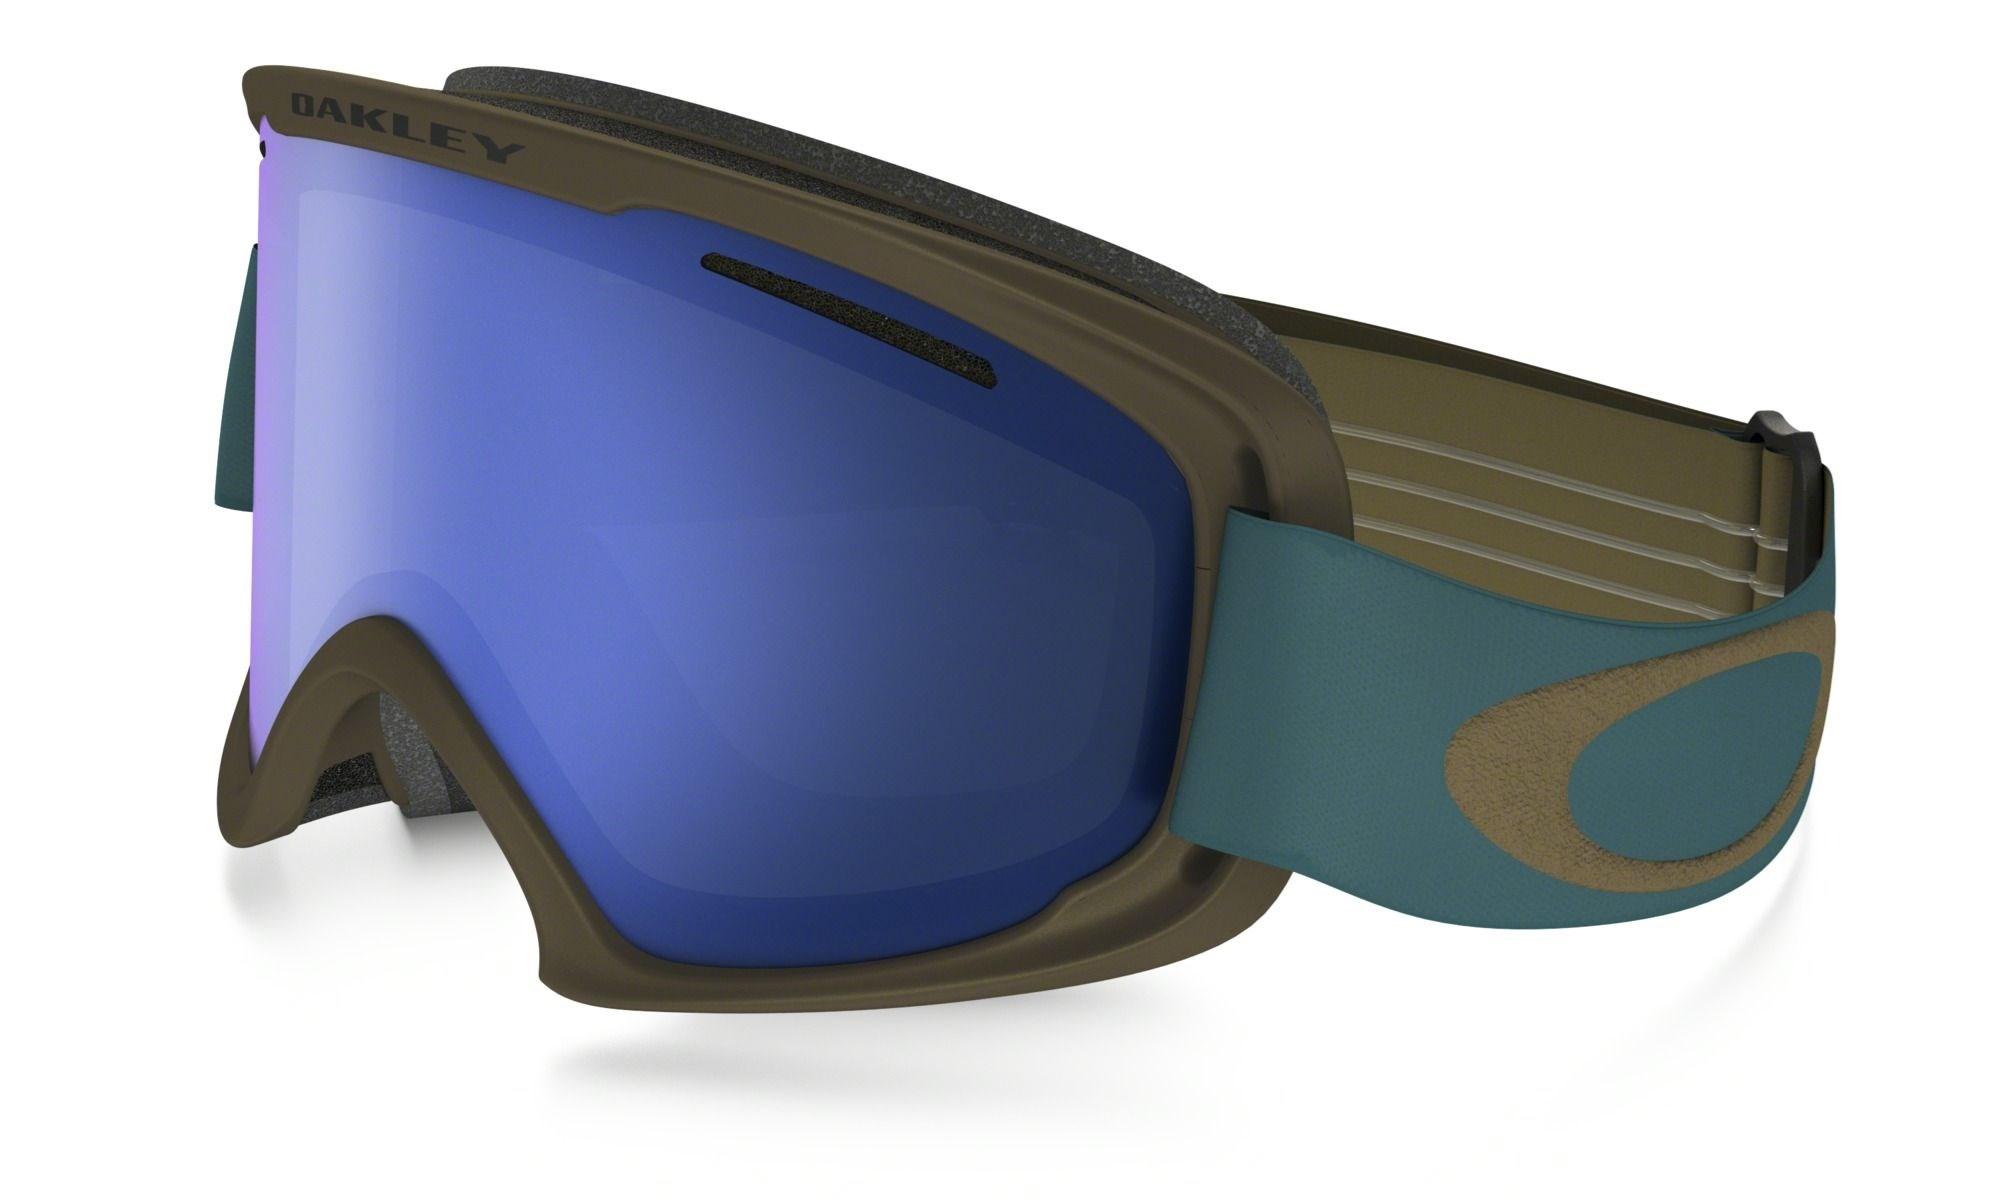 dfbe8f1d85 Oakley 02 XL Ski Goggles Copper Aurora Blue Black Ice Iridium £80.00